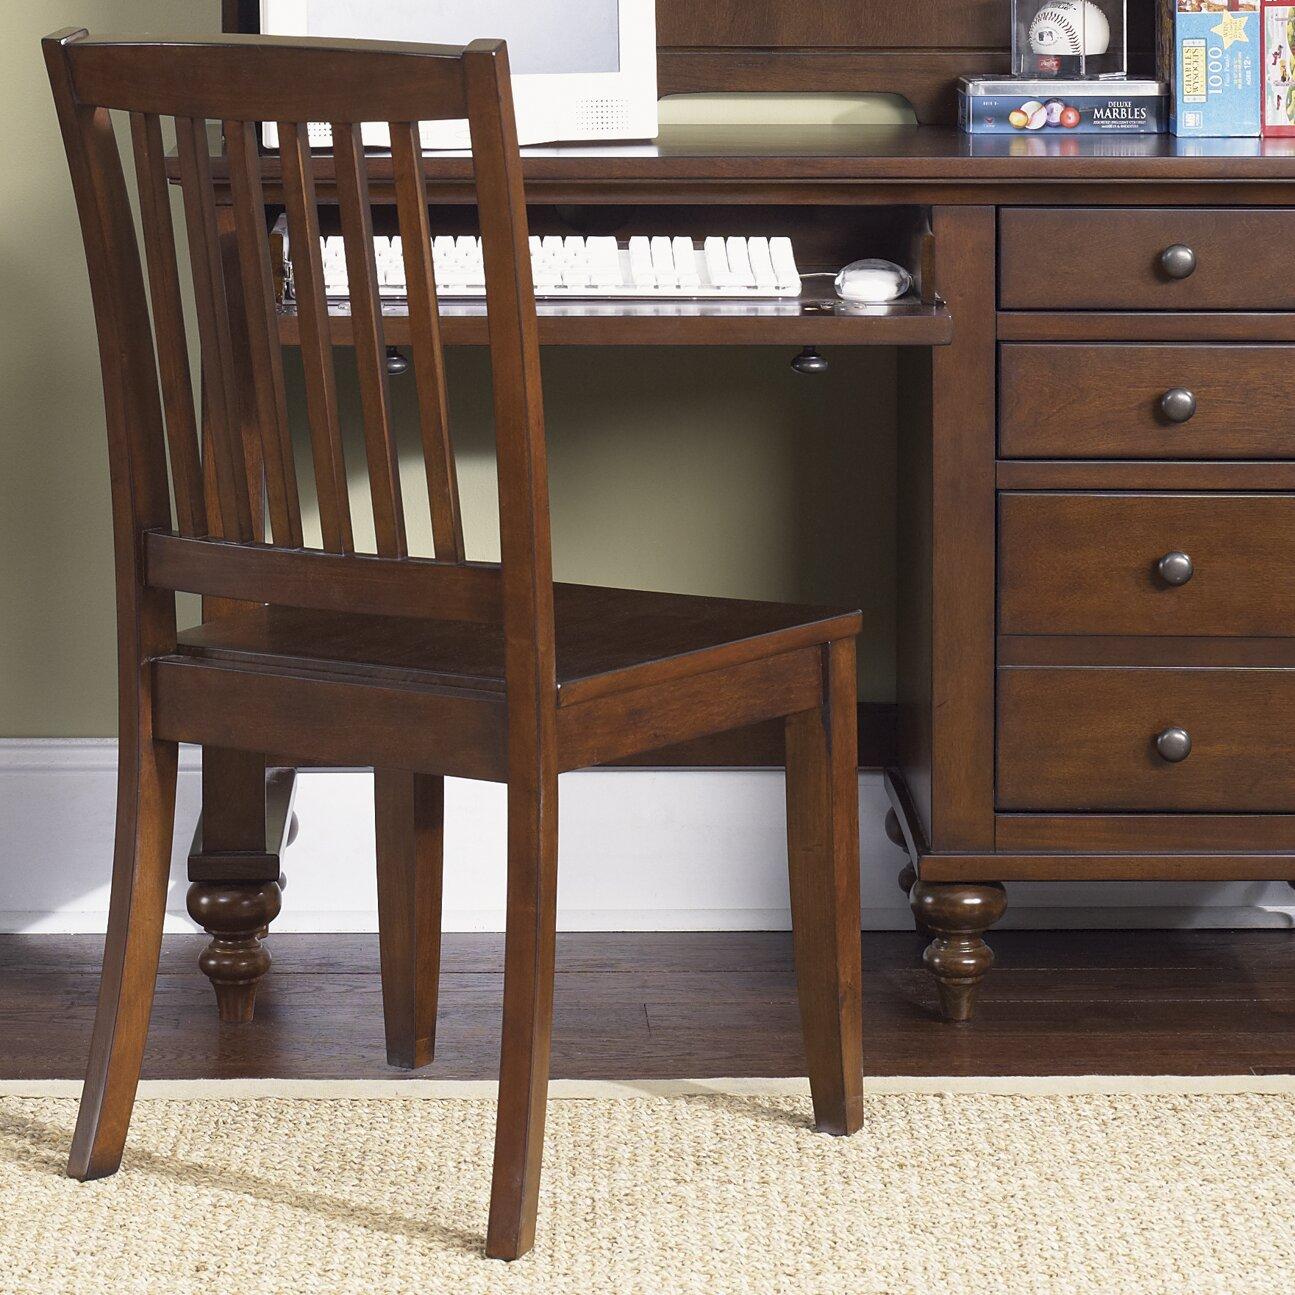 Office Bedroom Furniture: Liberty Furniture Abbott Ridge Panel Customizable Bedroom